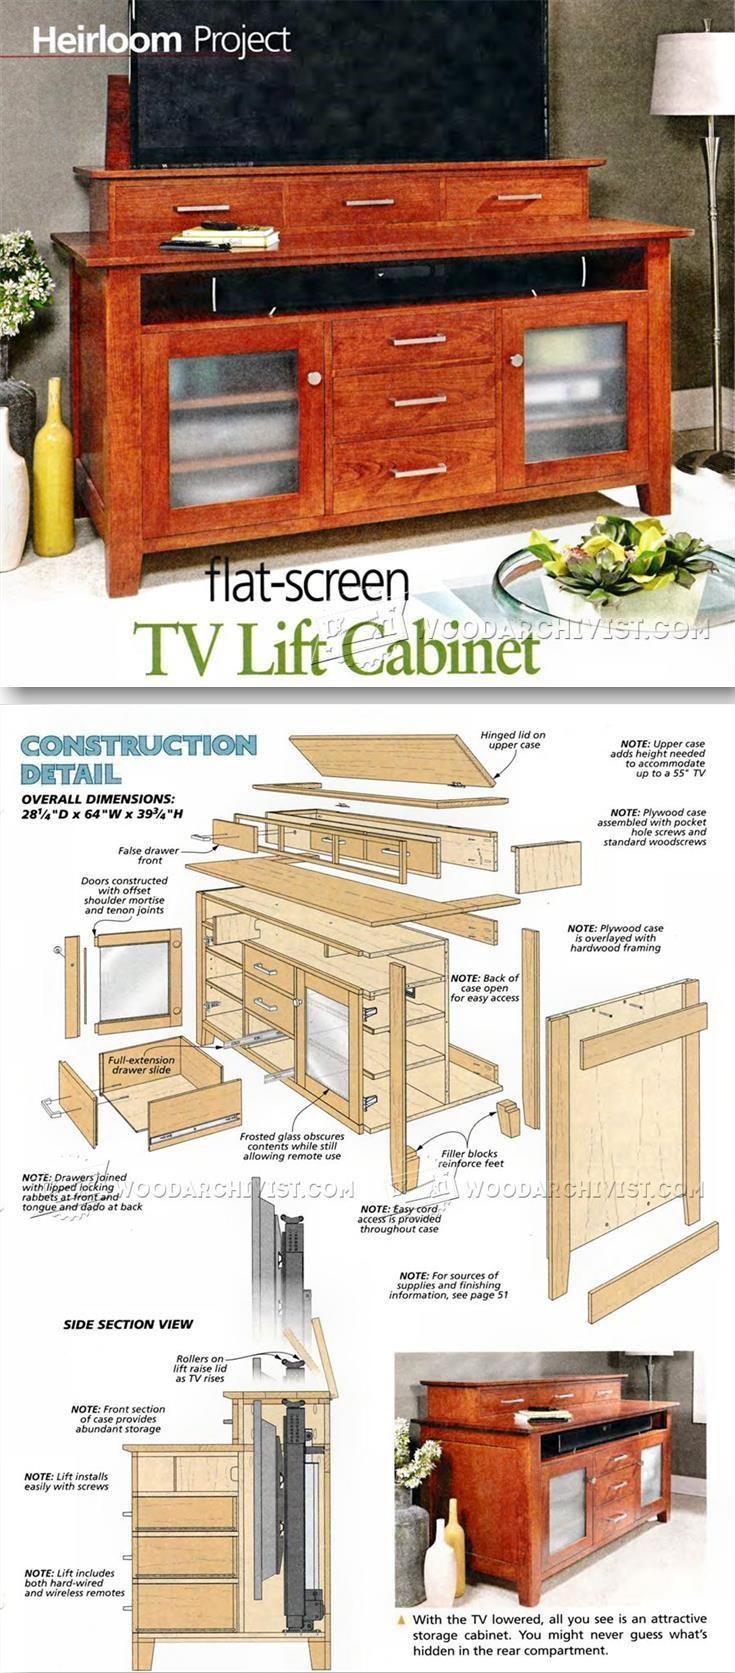 Deathstar Clock Limited Tools Woodworking Furniture Plans Furniture Plans Cabinet Plans